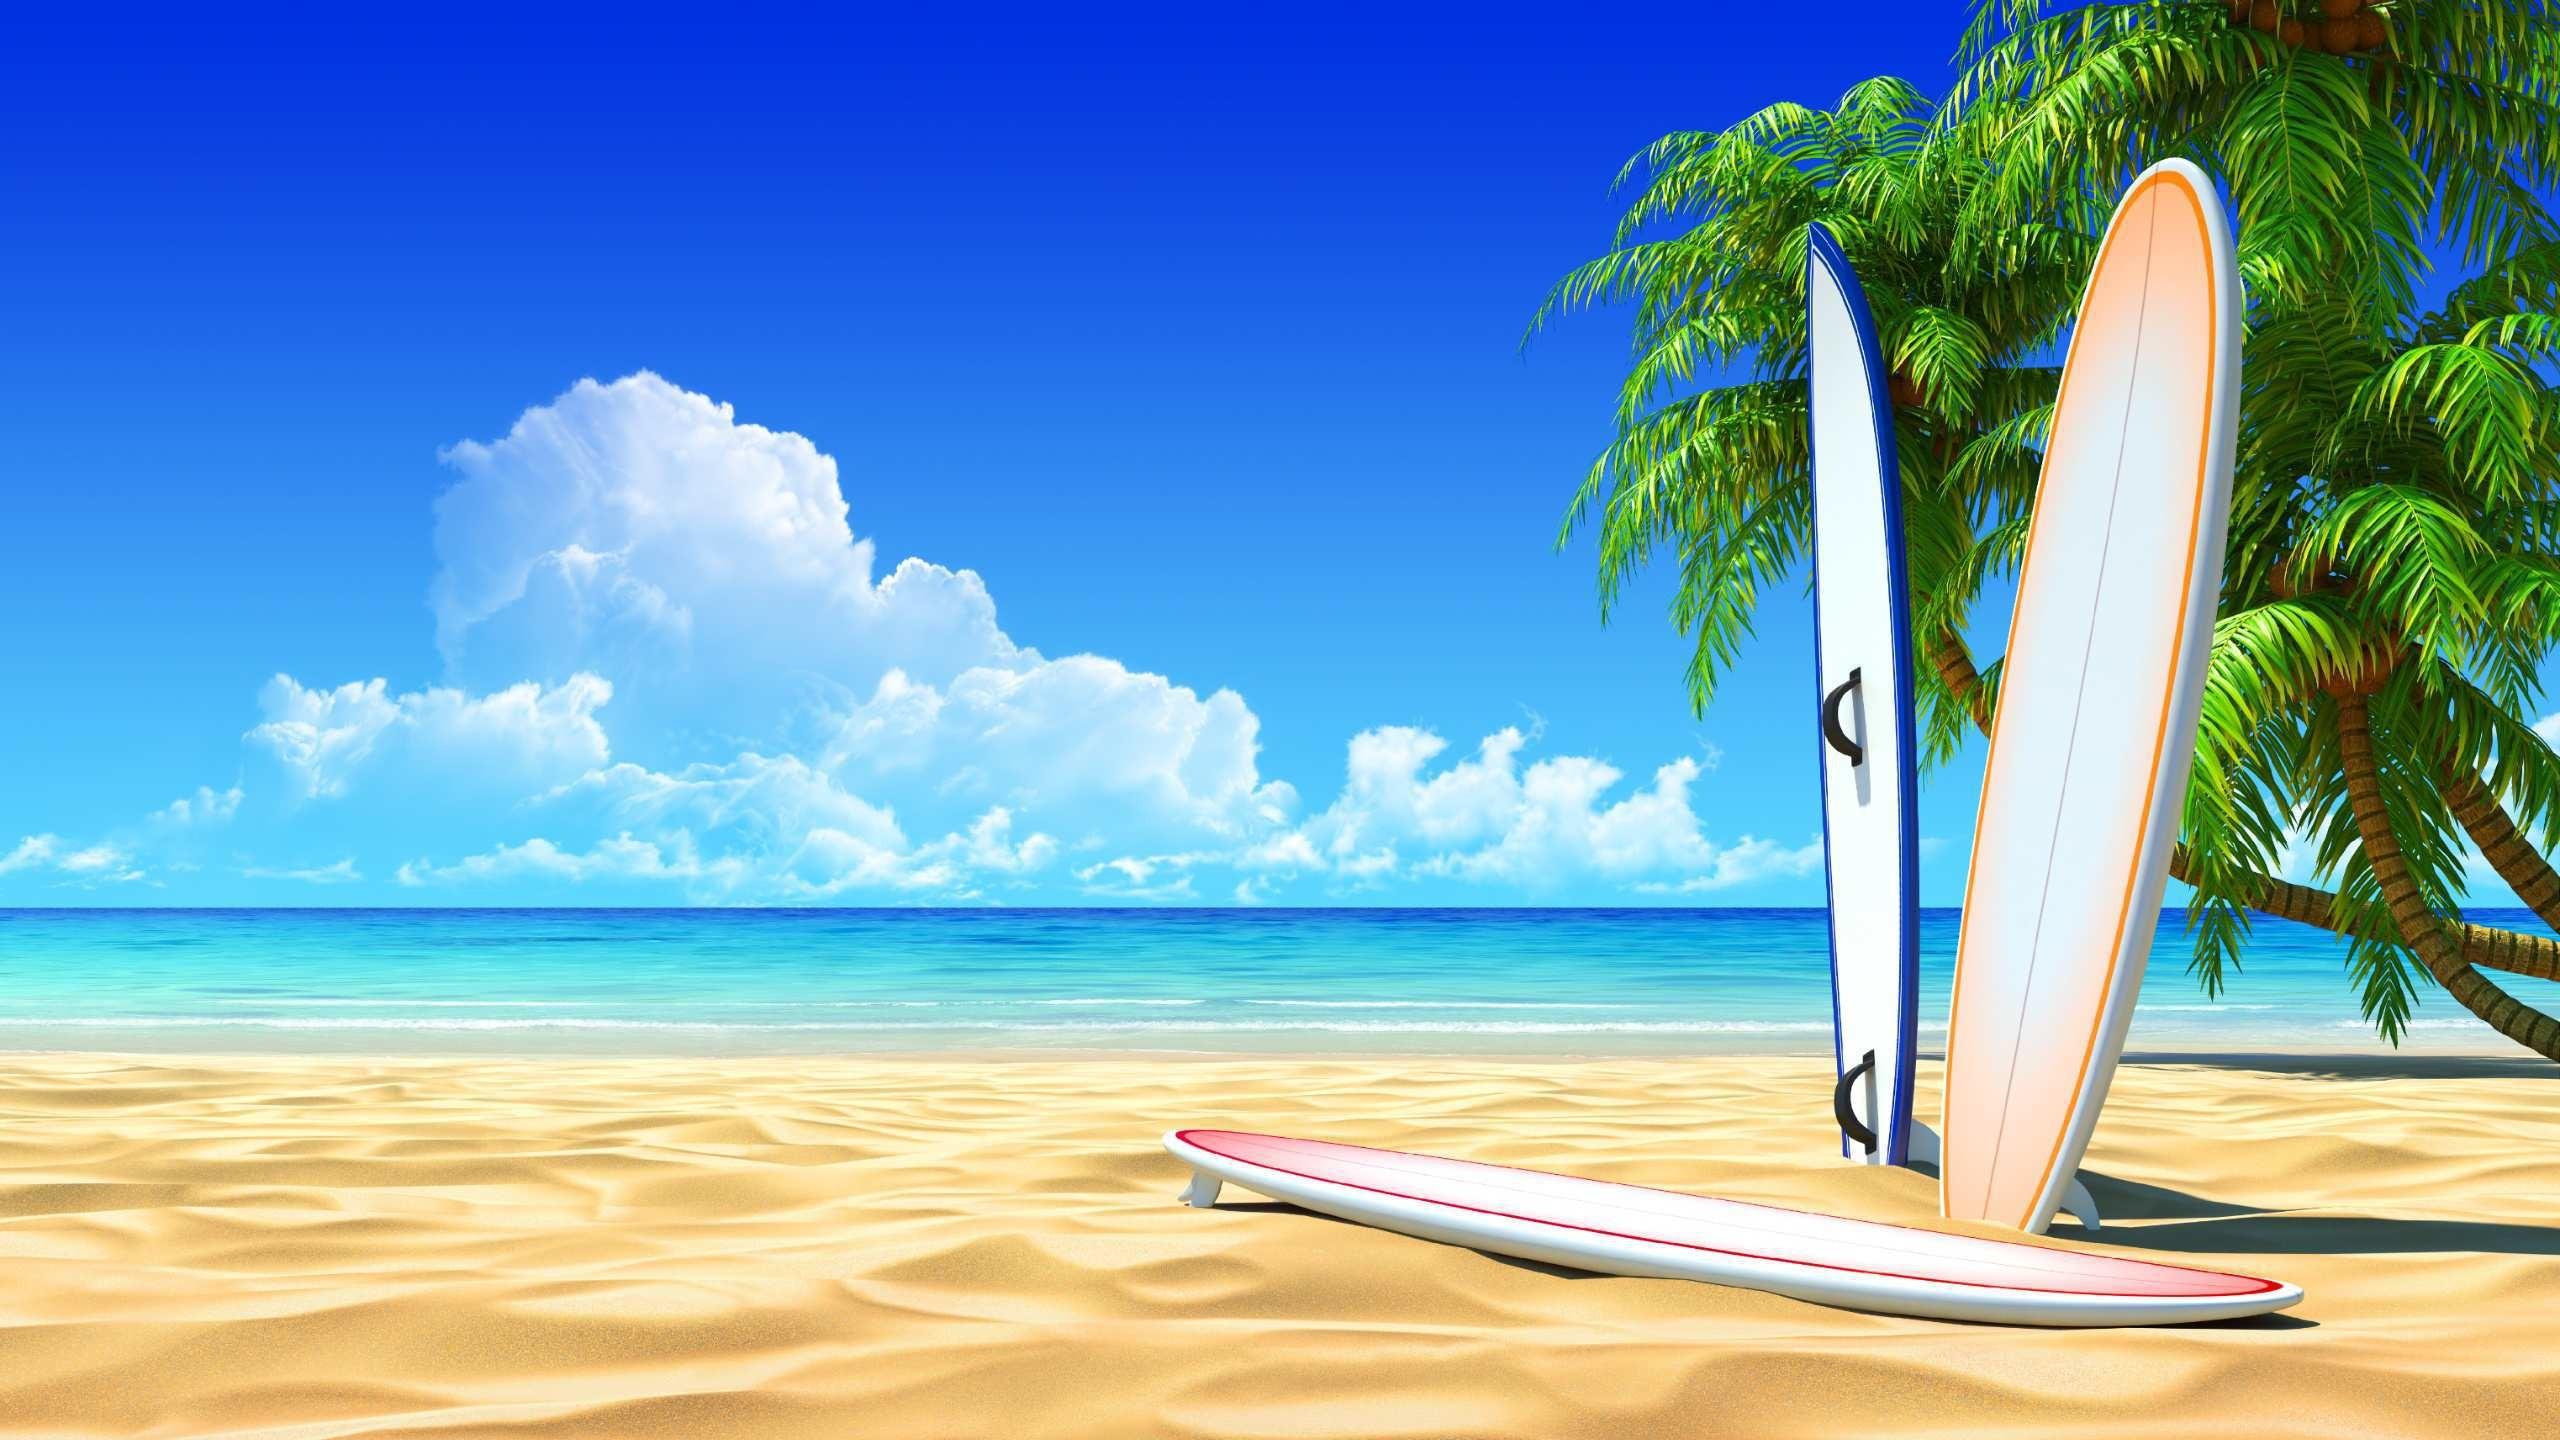 Surfboard Wallpaper 67 Images